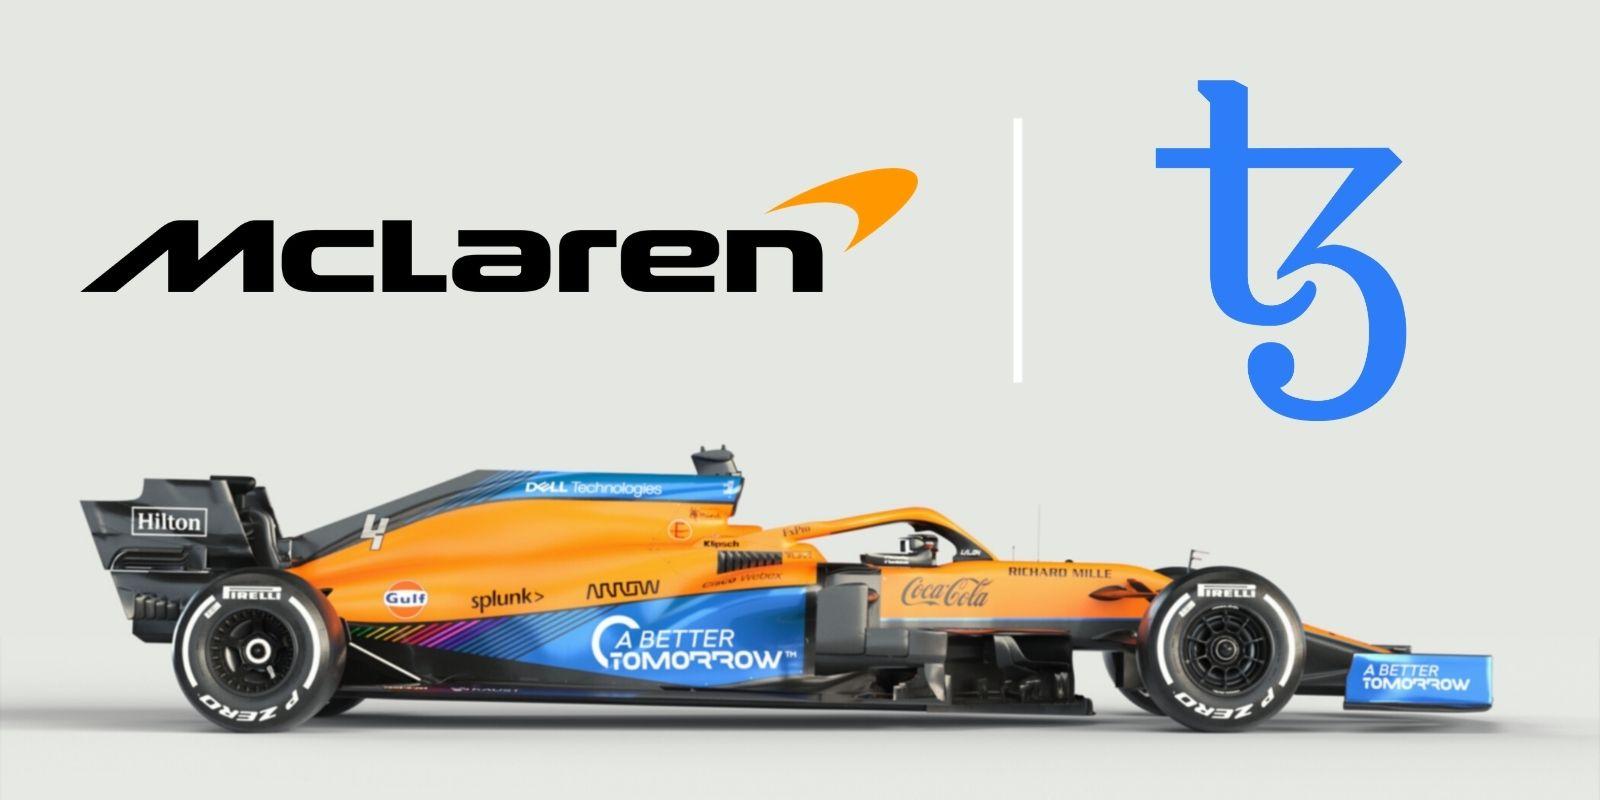 Đội đua F1 McLaren ra mắt bộ sưu tập NFT trên Tezos (XTZ)